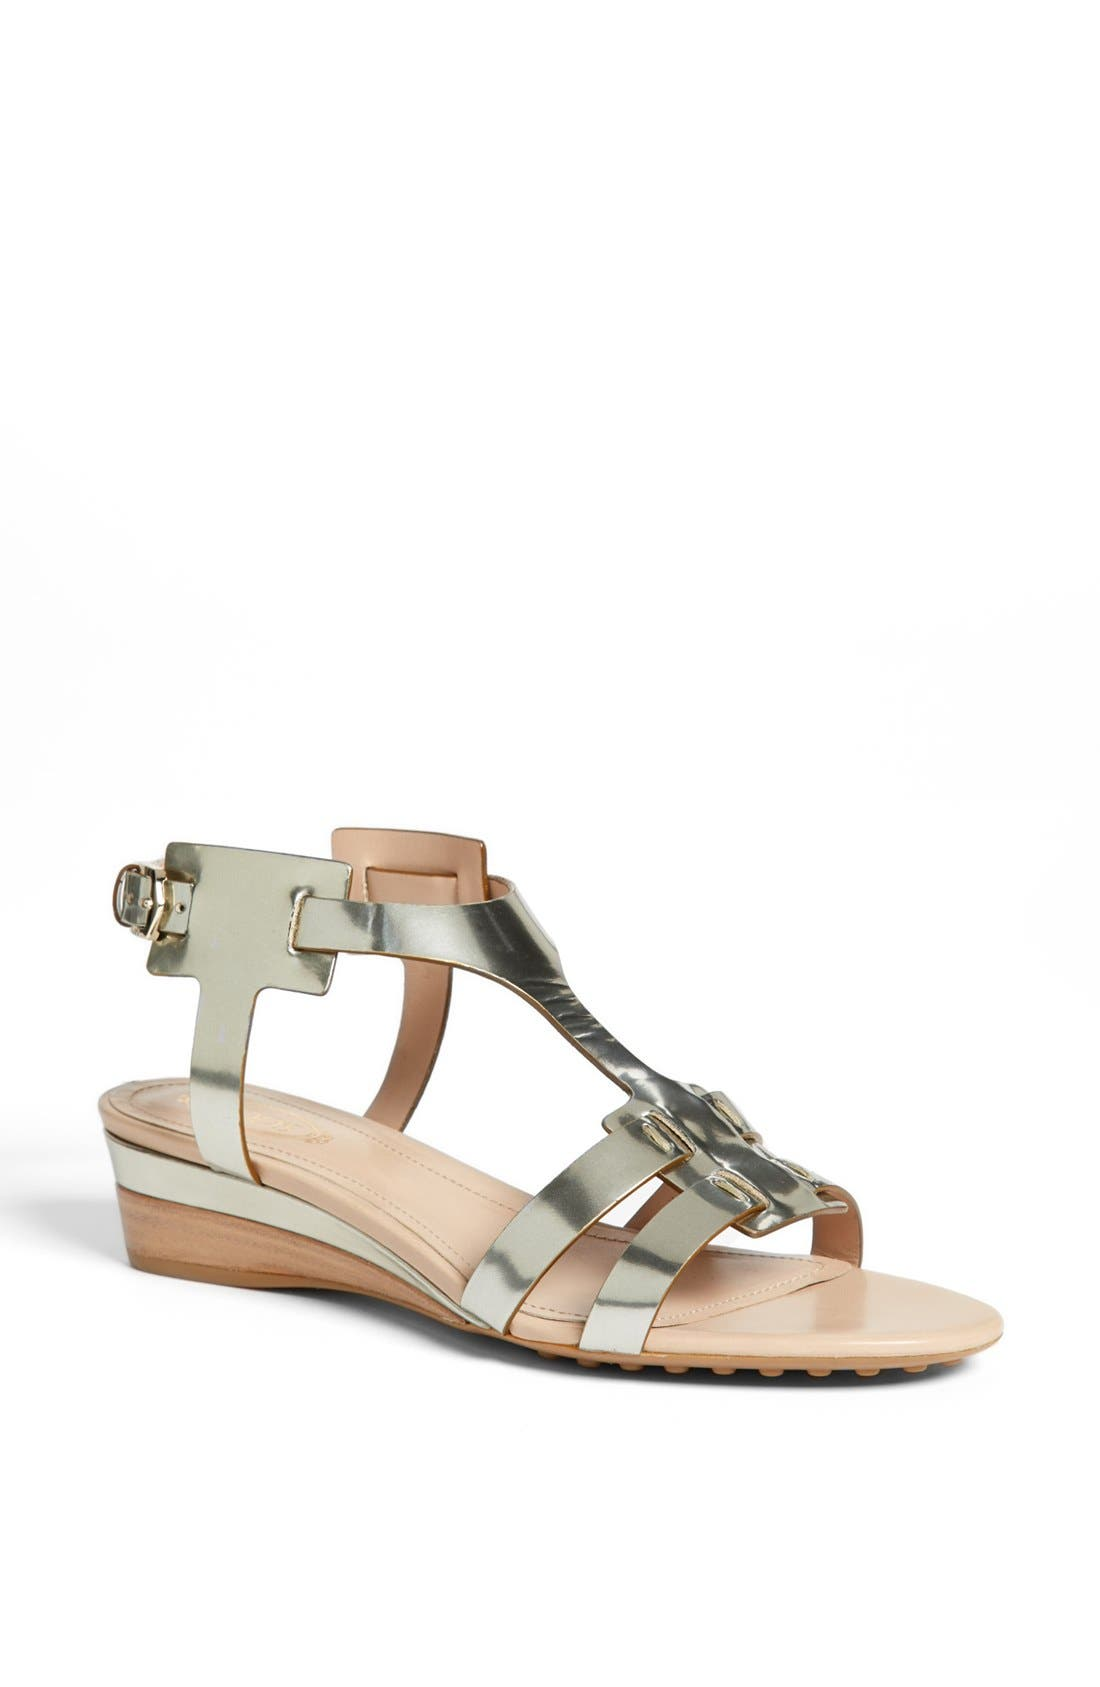 Alternate Image 1 Selected - Tod's 'Zeppa' Wedge Sandal